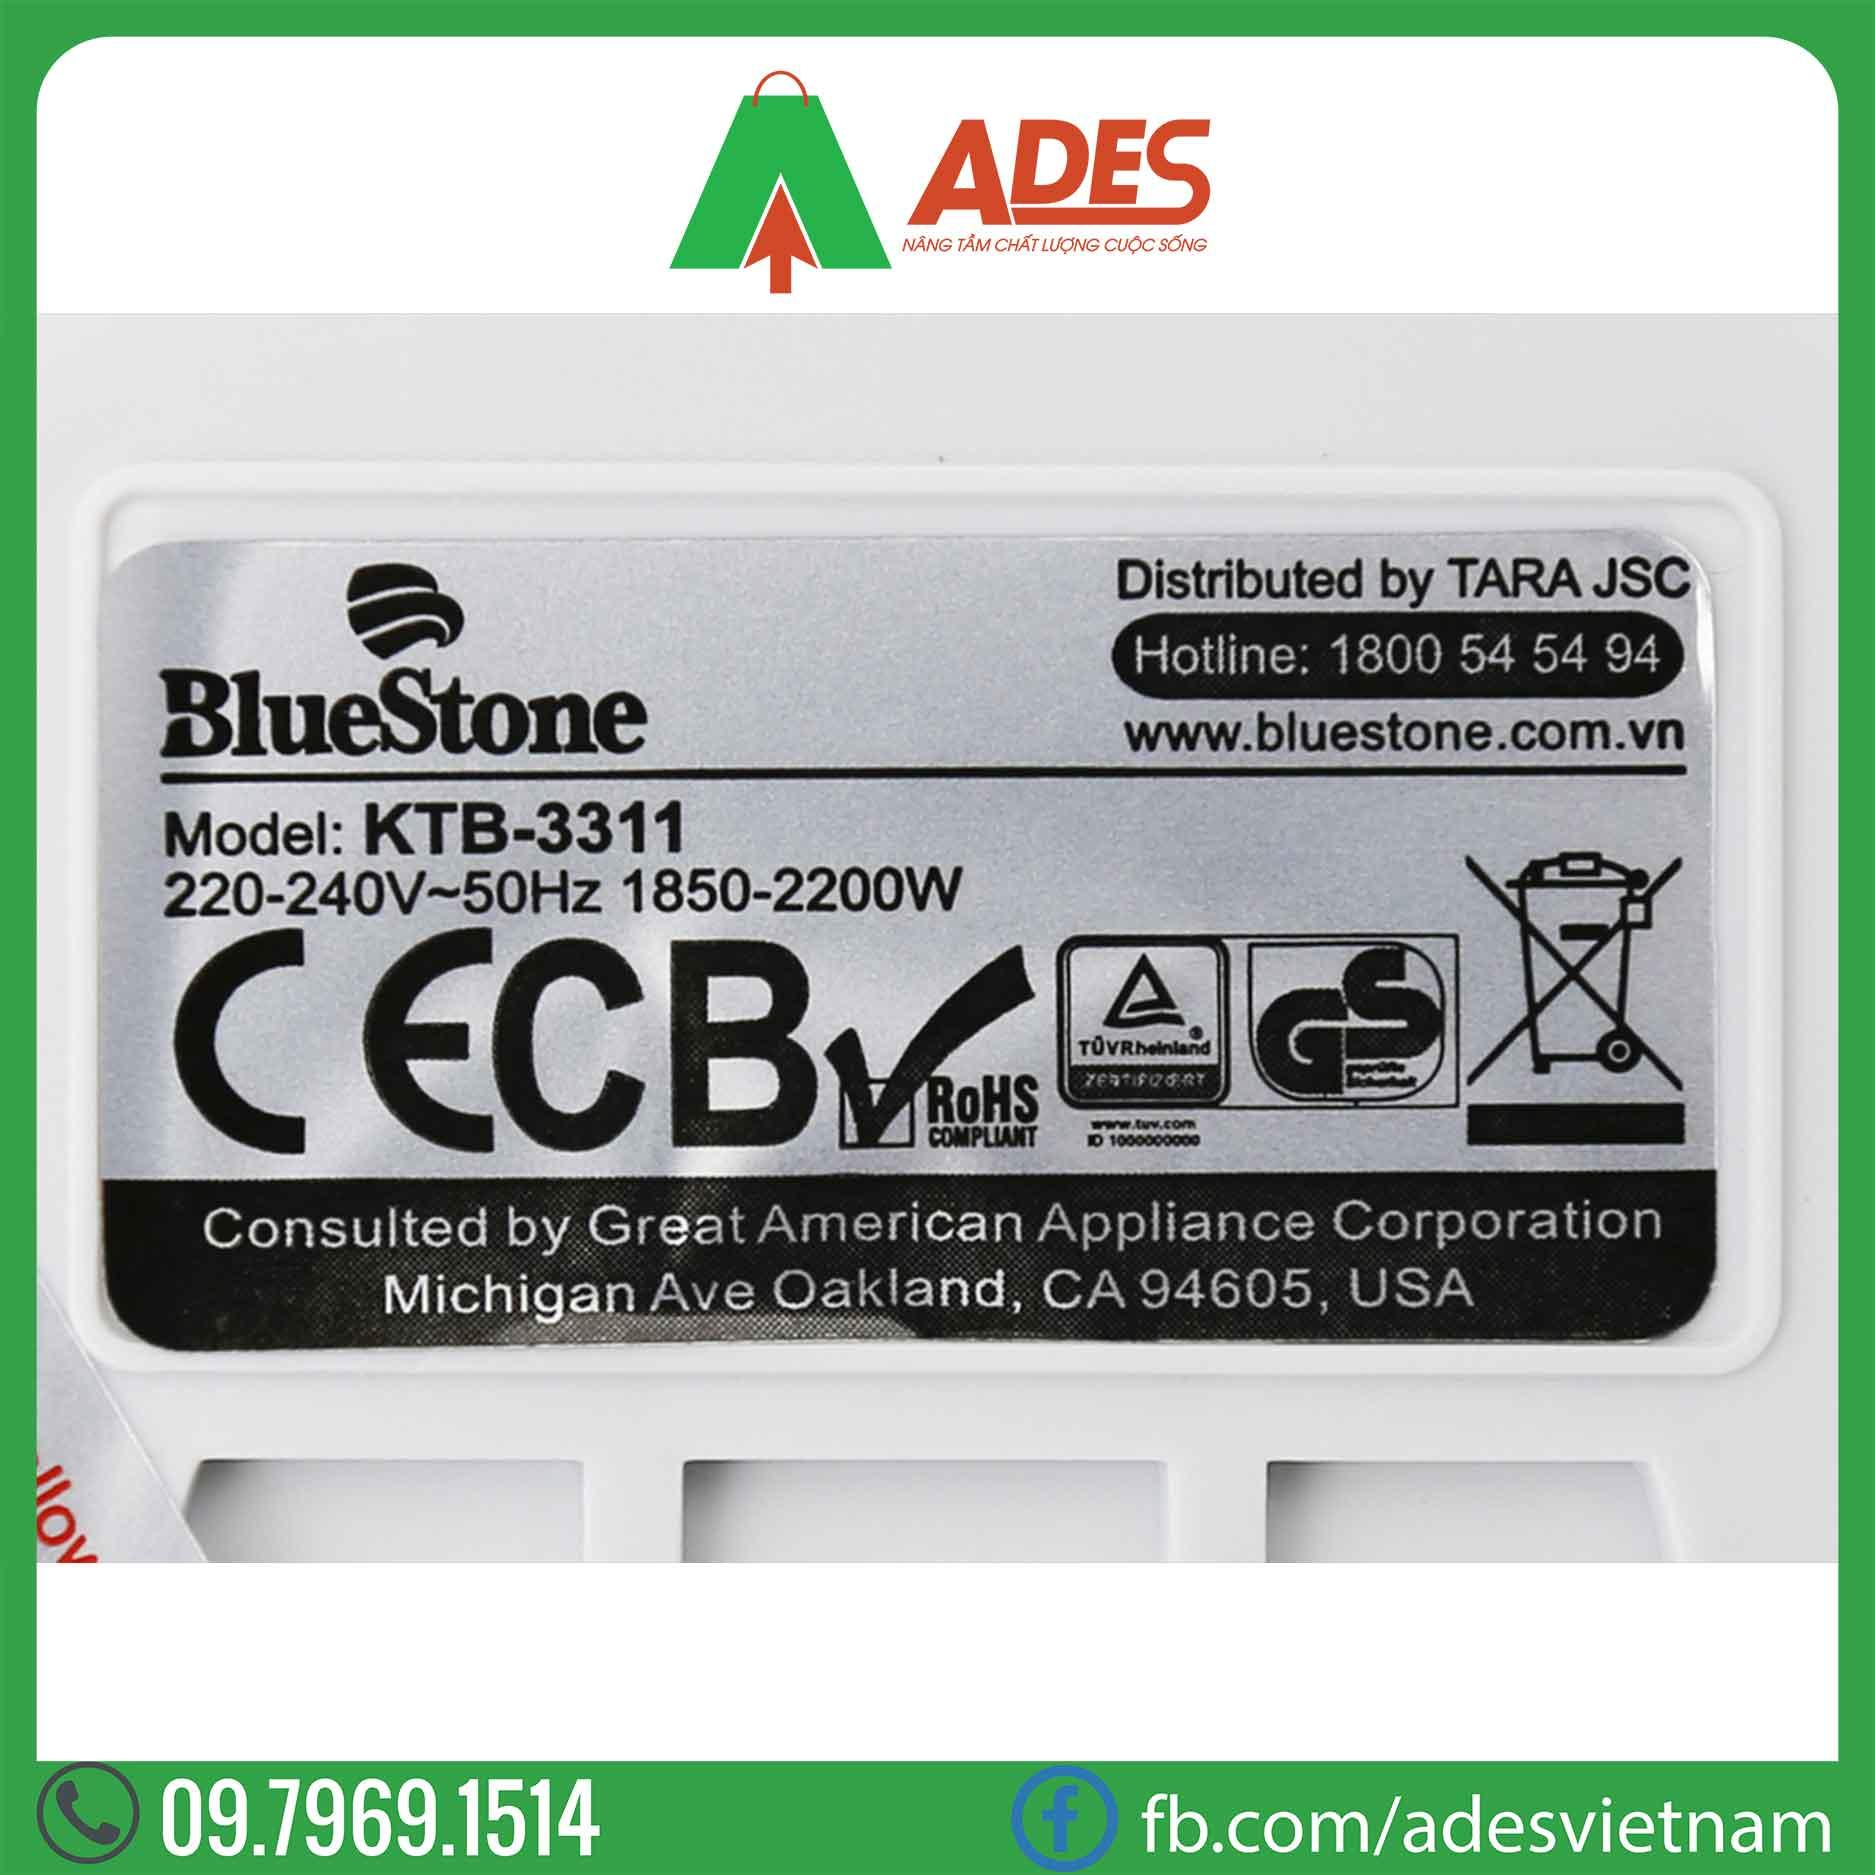 Am sieu toc Bluestone KTB-3311